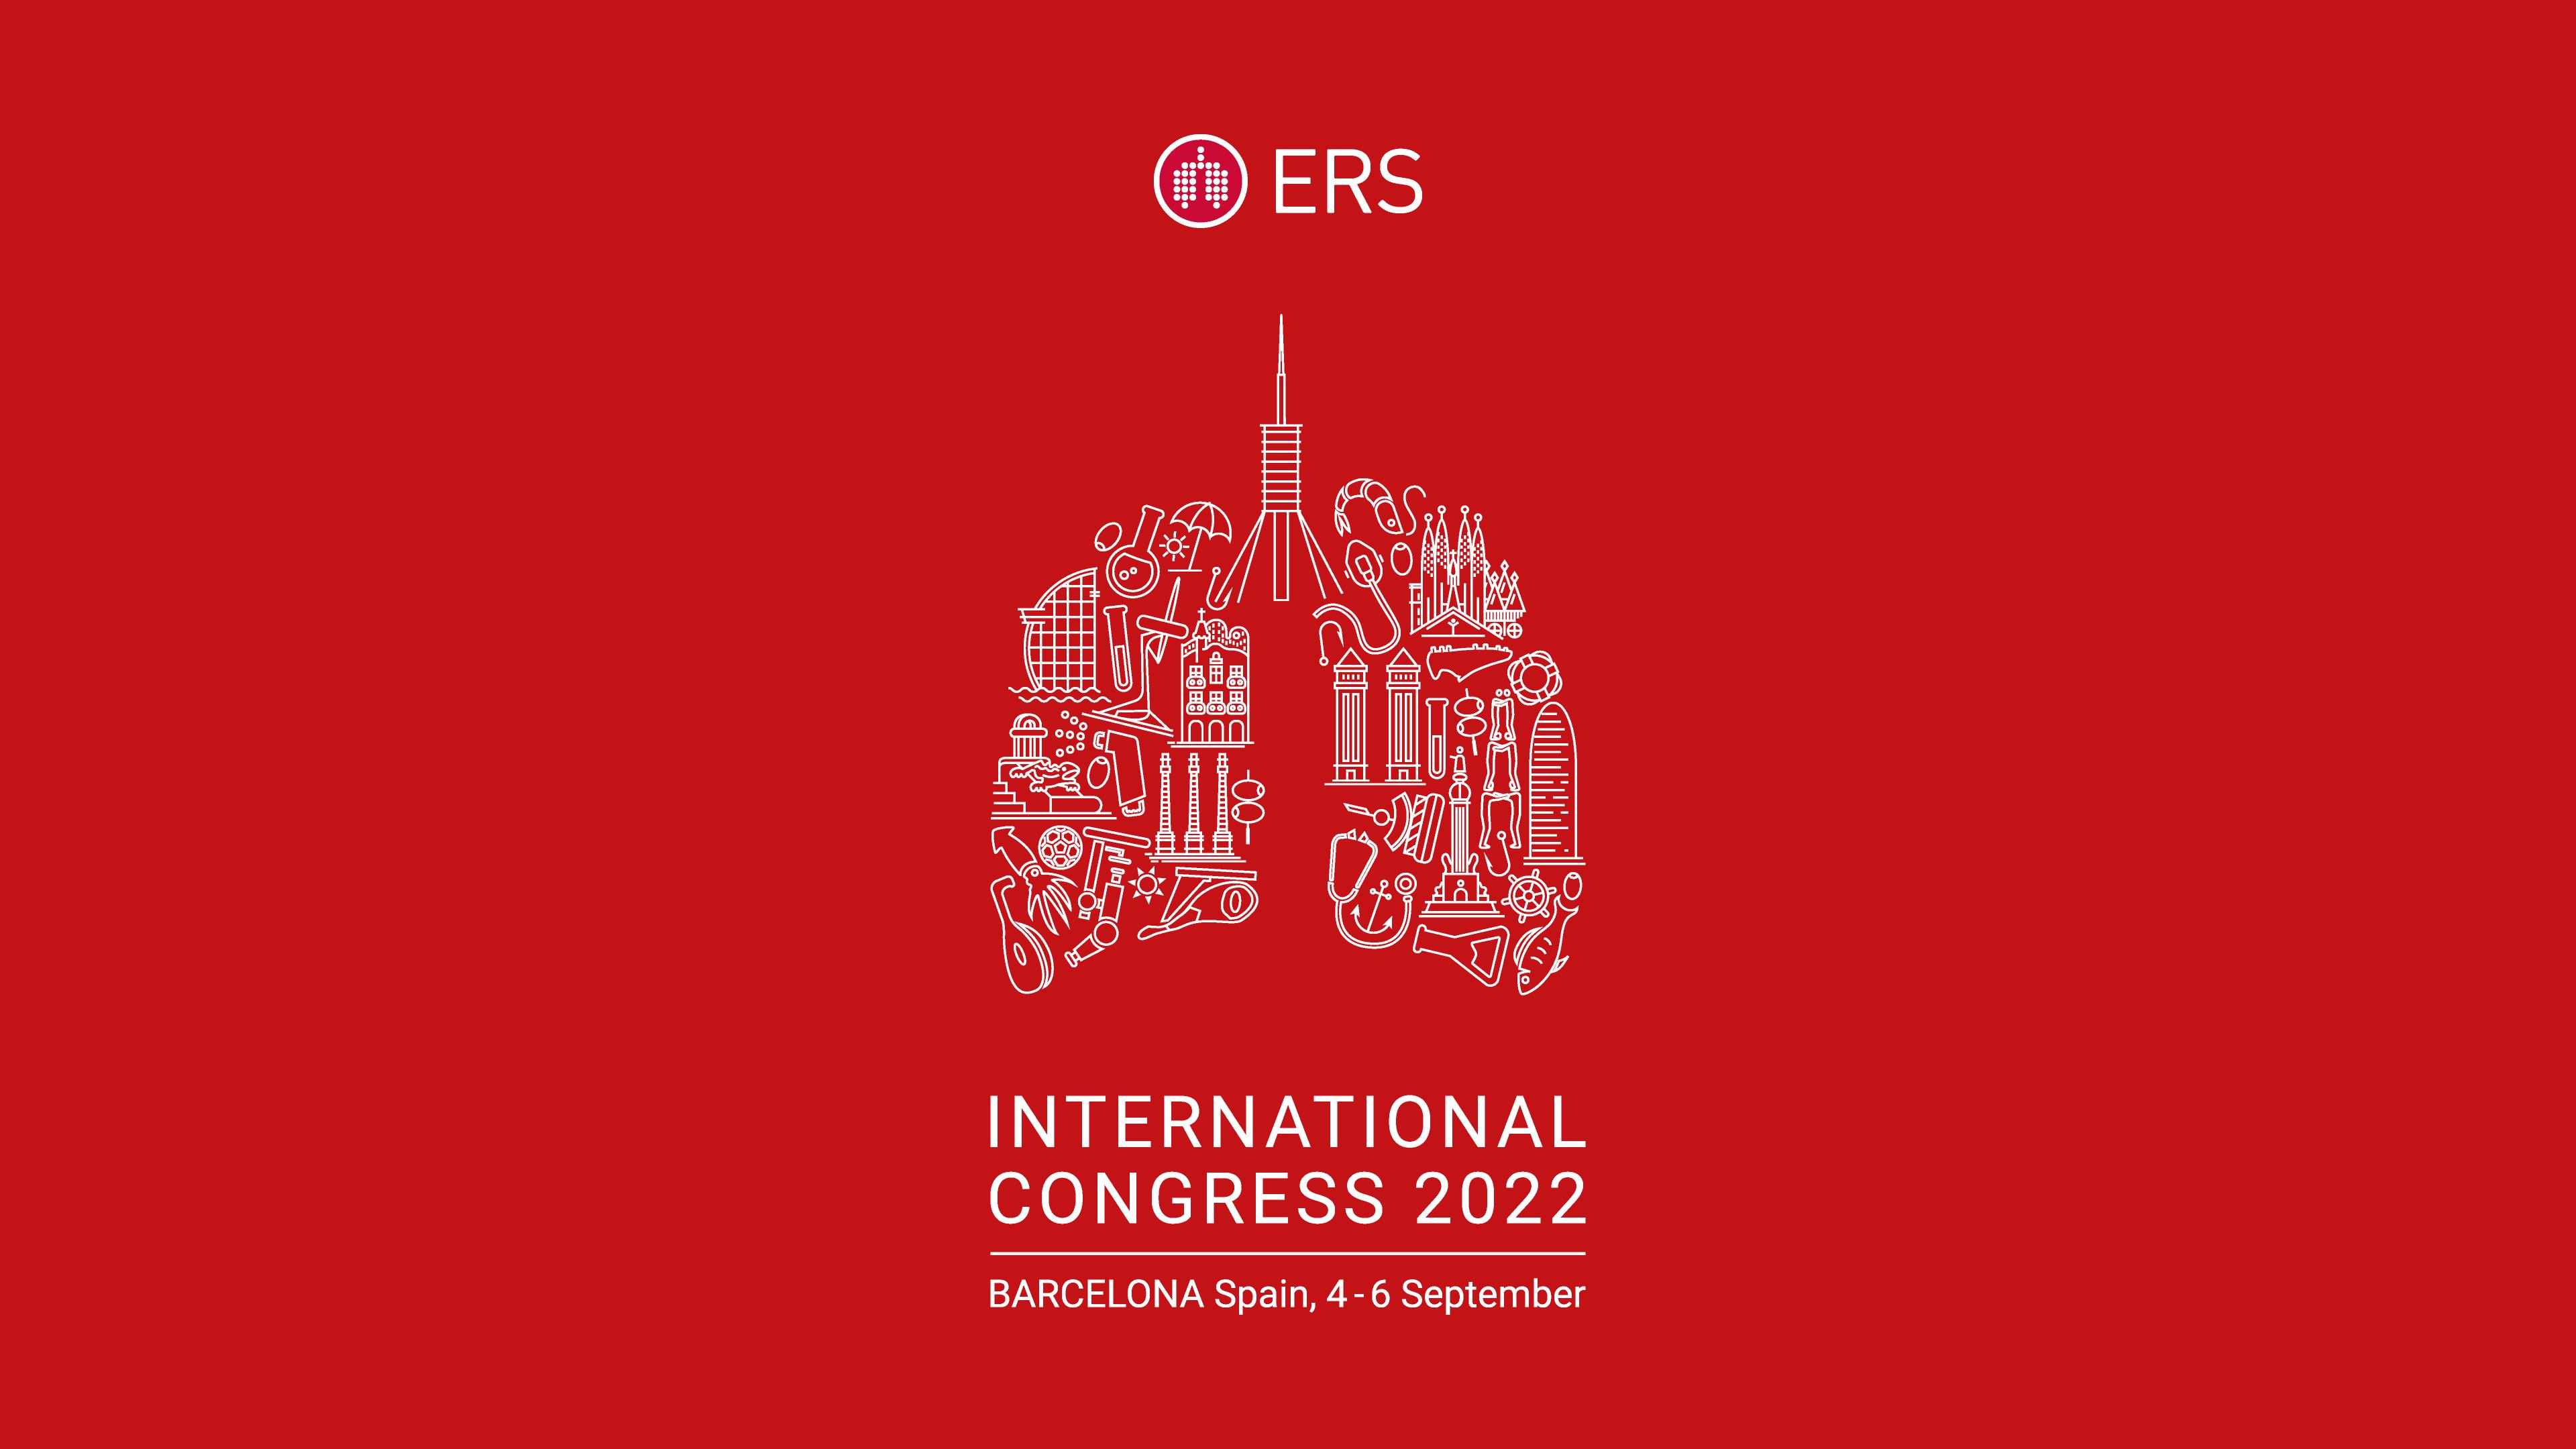 ERS International Congress 2022 - Preview Image